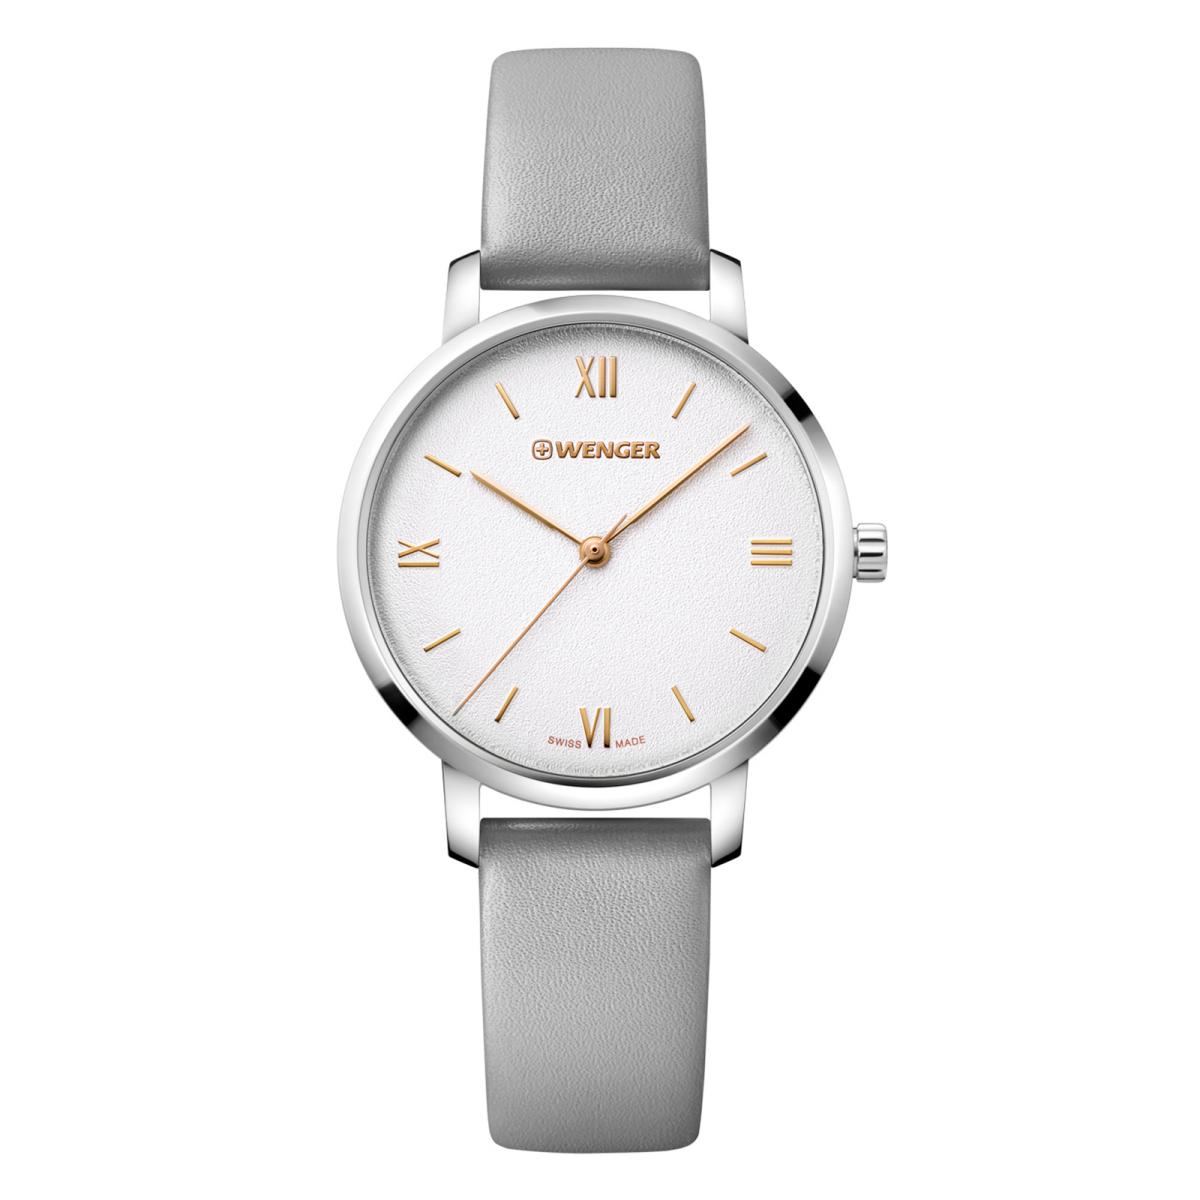 ebfa081f4466 Reloj Wenger - 01.1731.102 - MUJER - Time Square